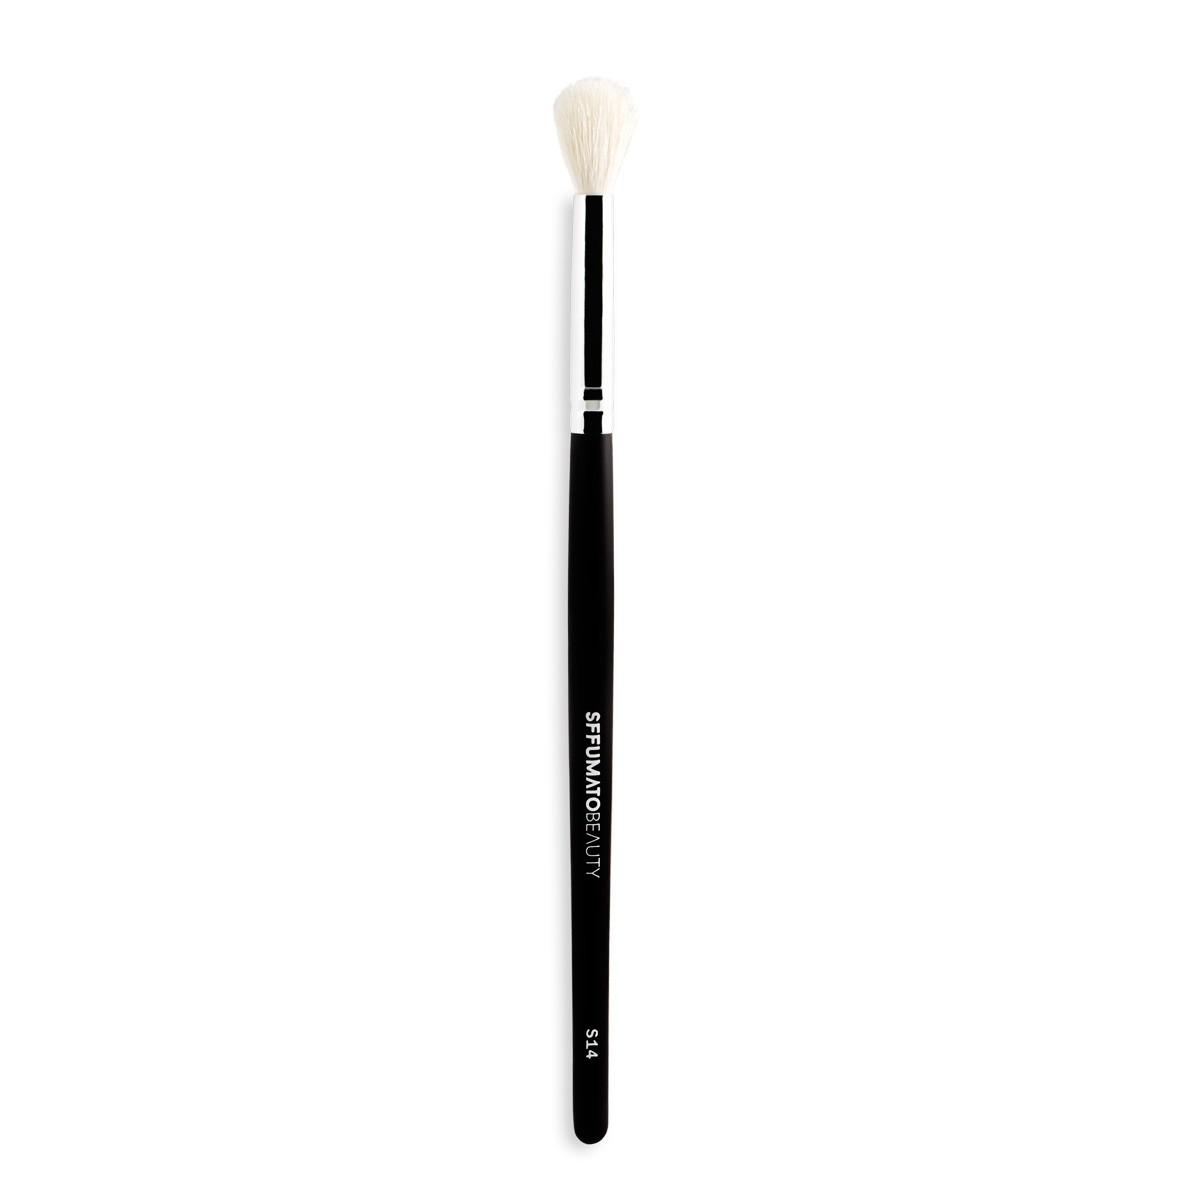 S14 - Pincel Profissional Para Esfumar Sffumato Beauty